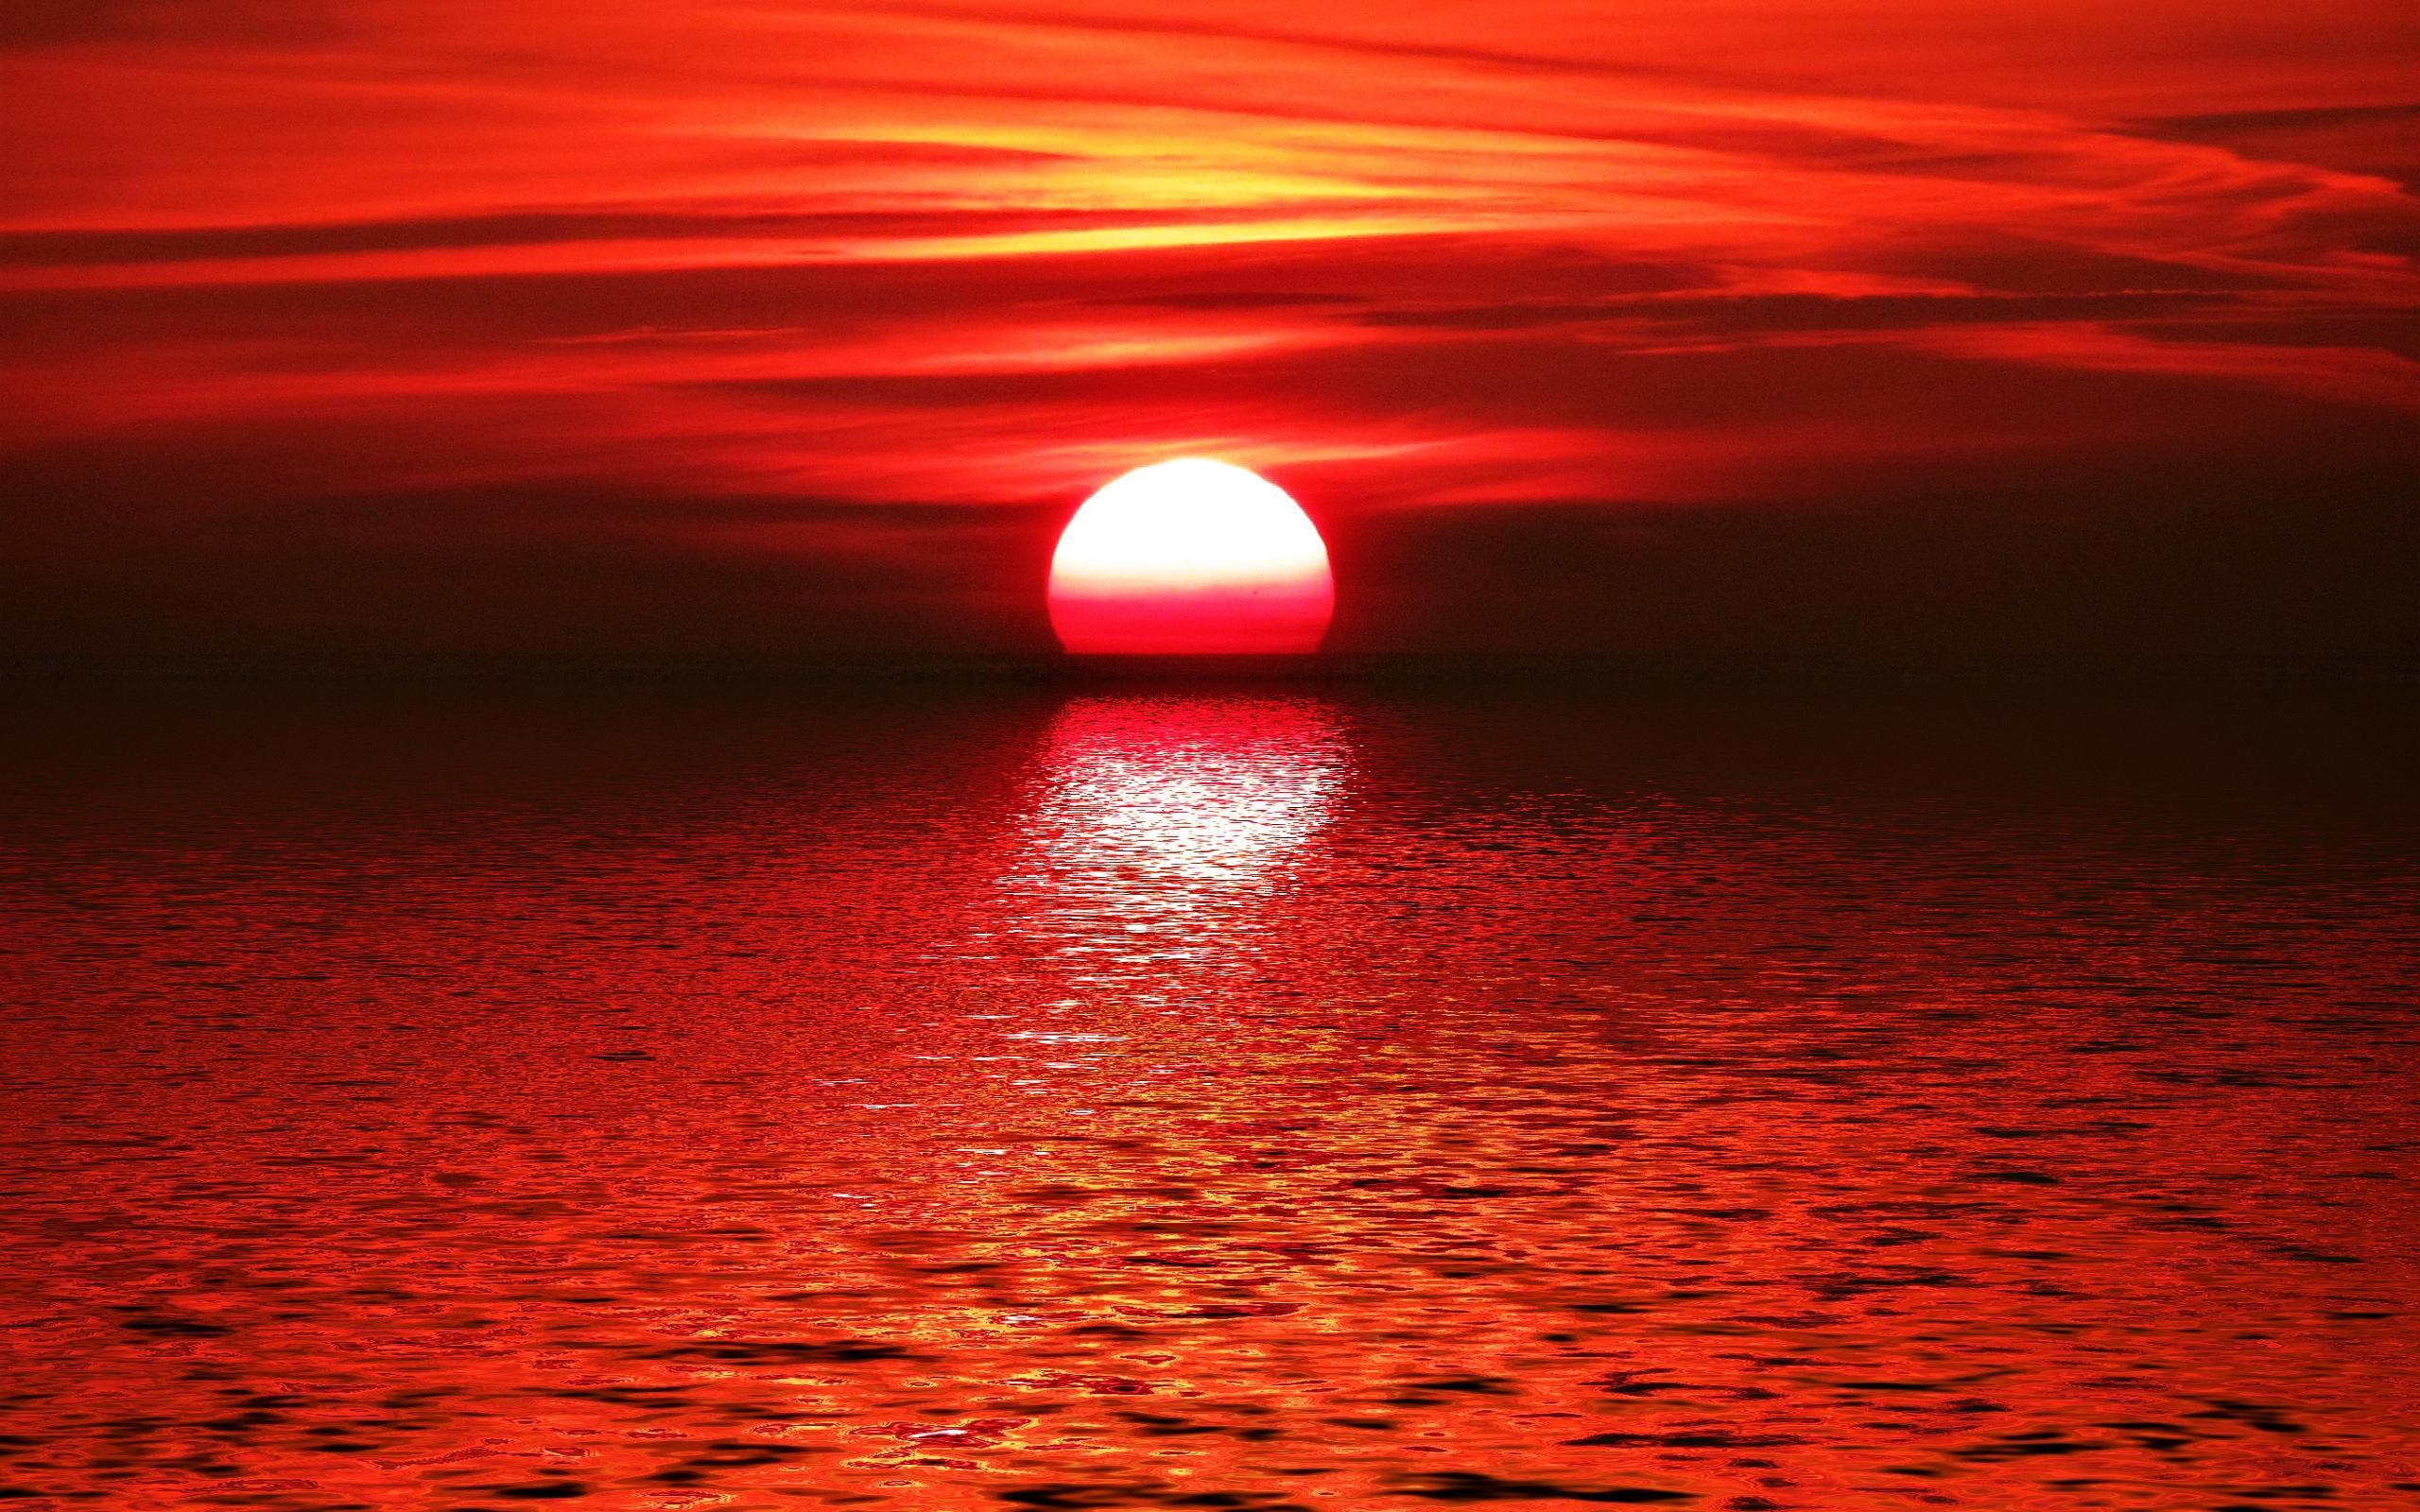 Hd Beautiful Red Sunset Wallpaper Cool Car Wallpapers